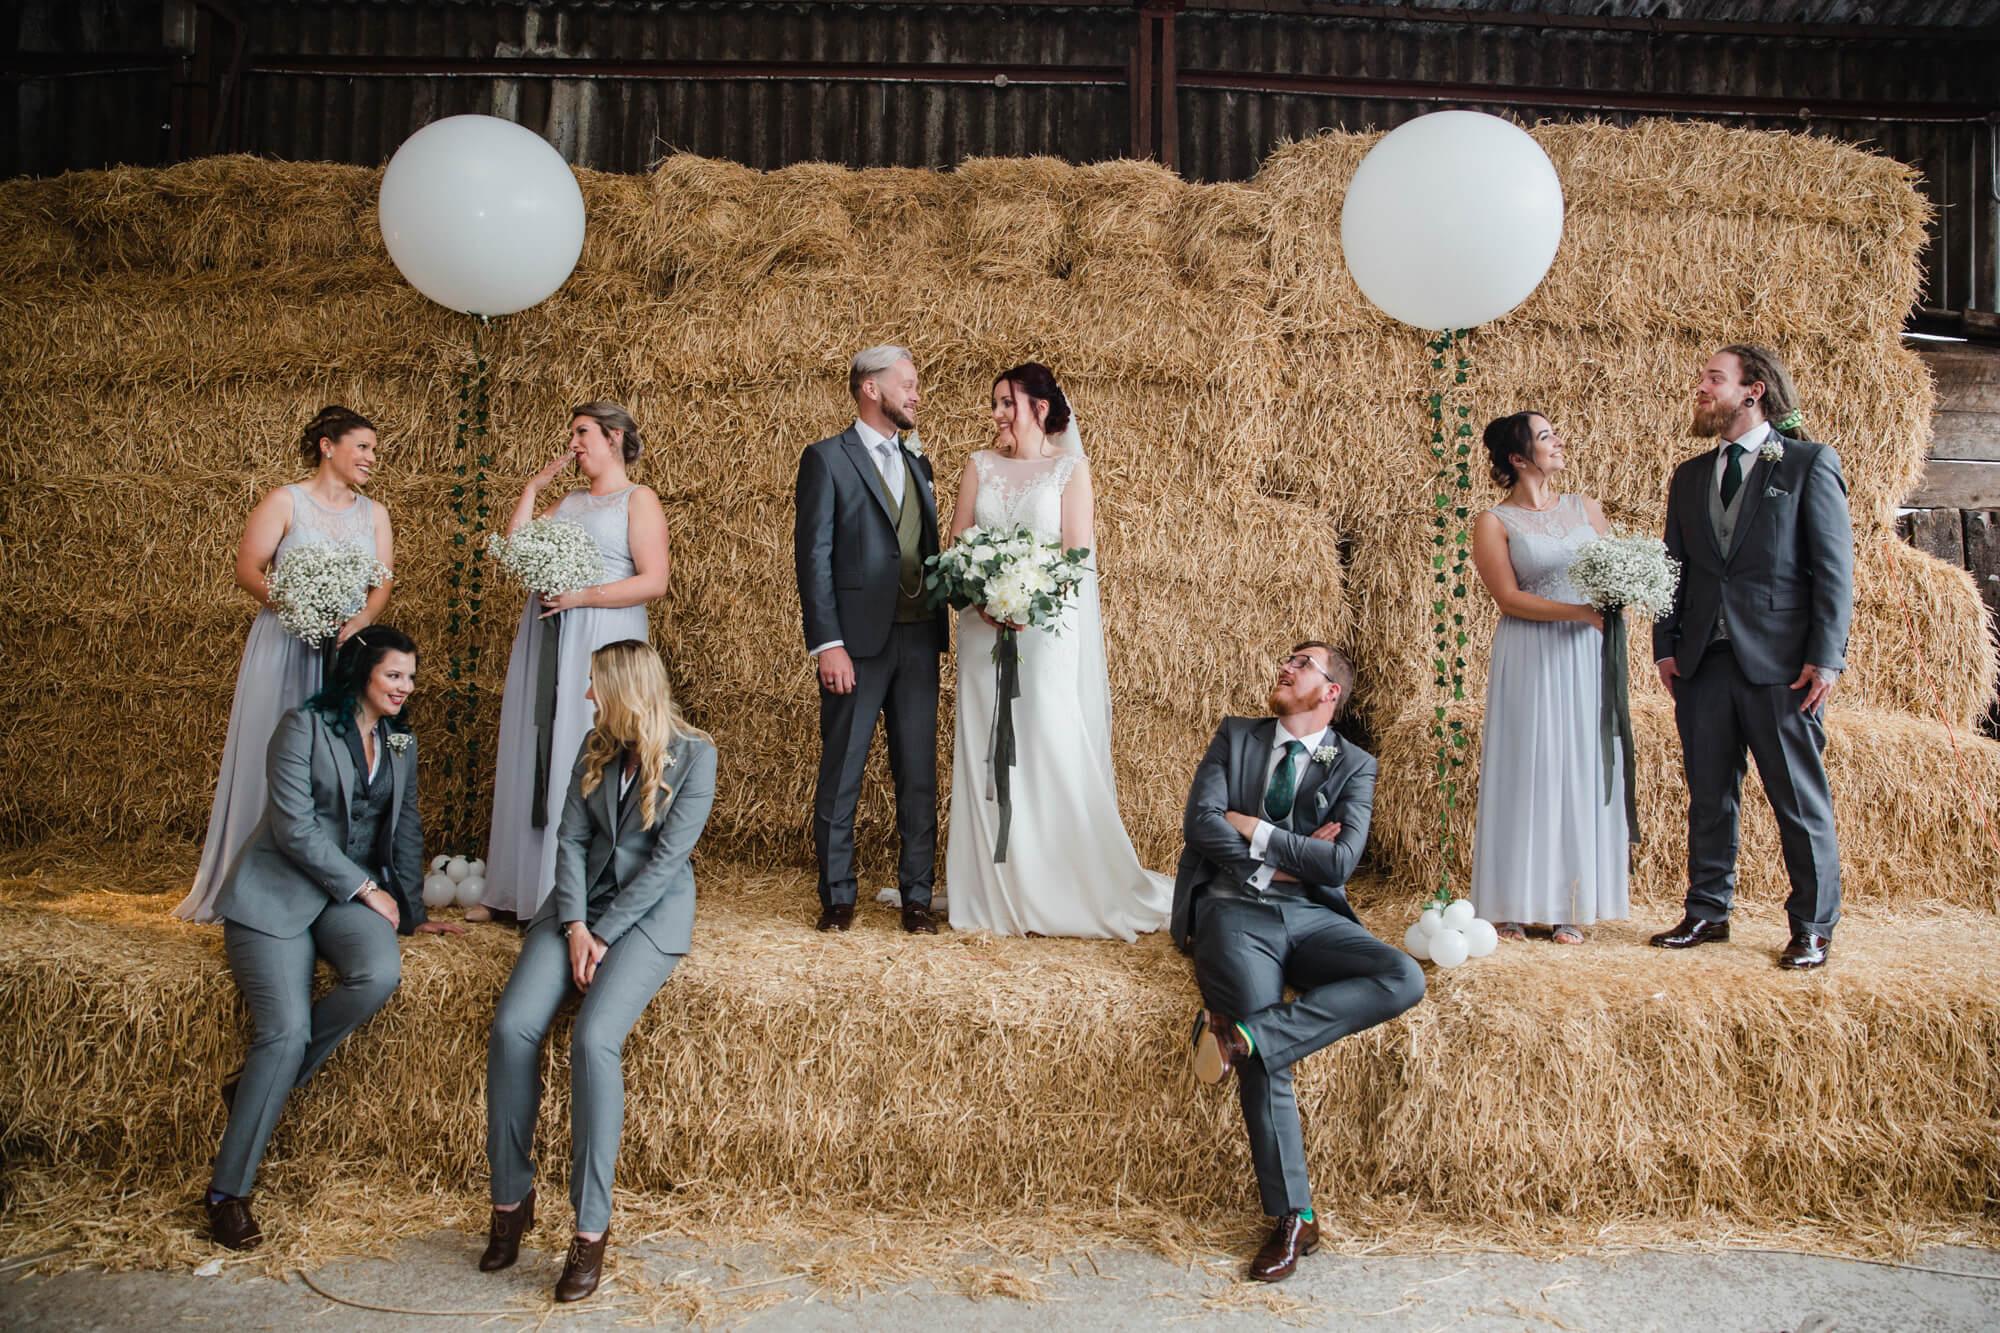 Owen House Wedding Barn photography group portrait on hay bale backdrop